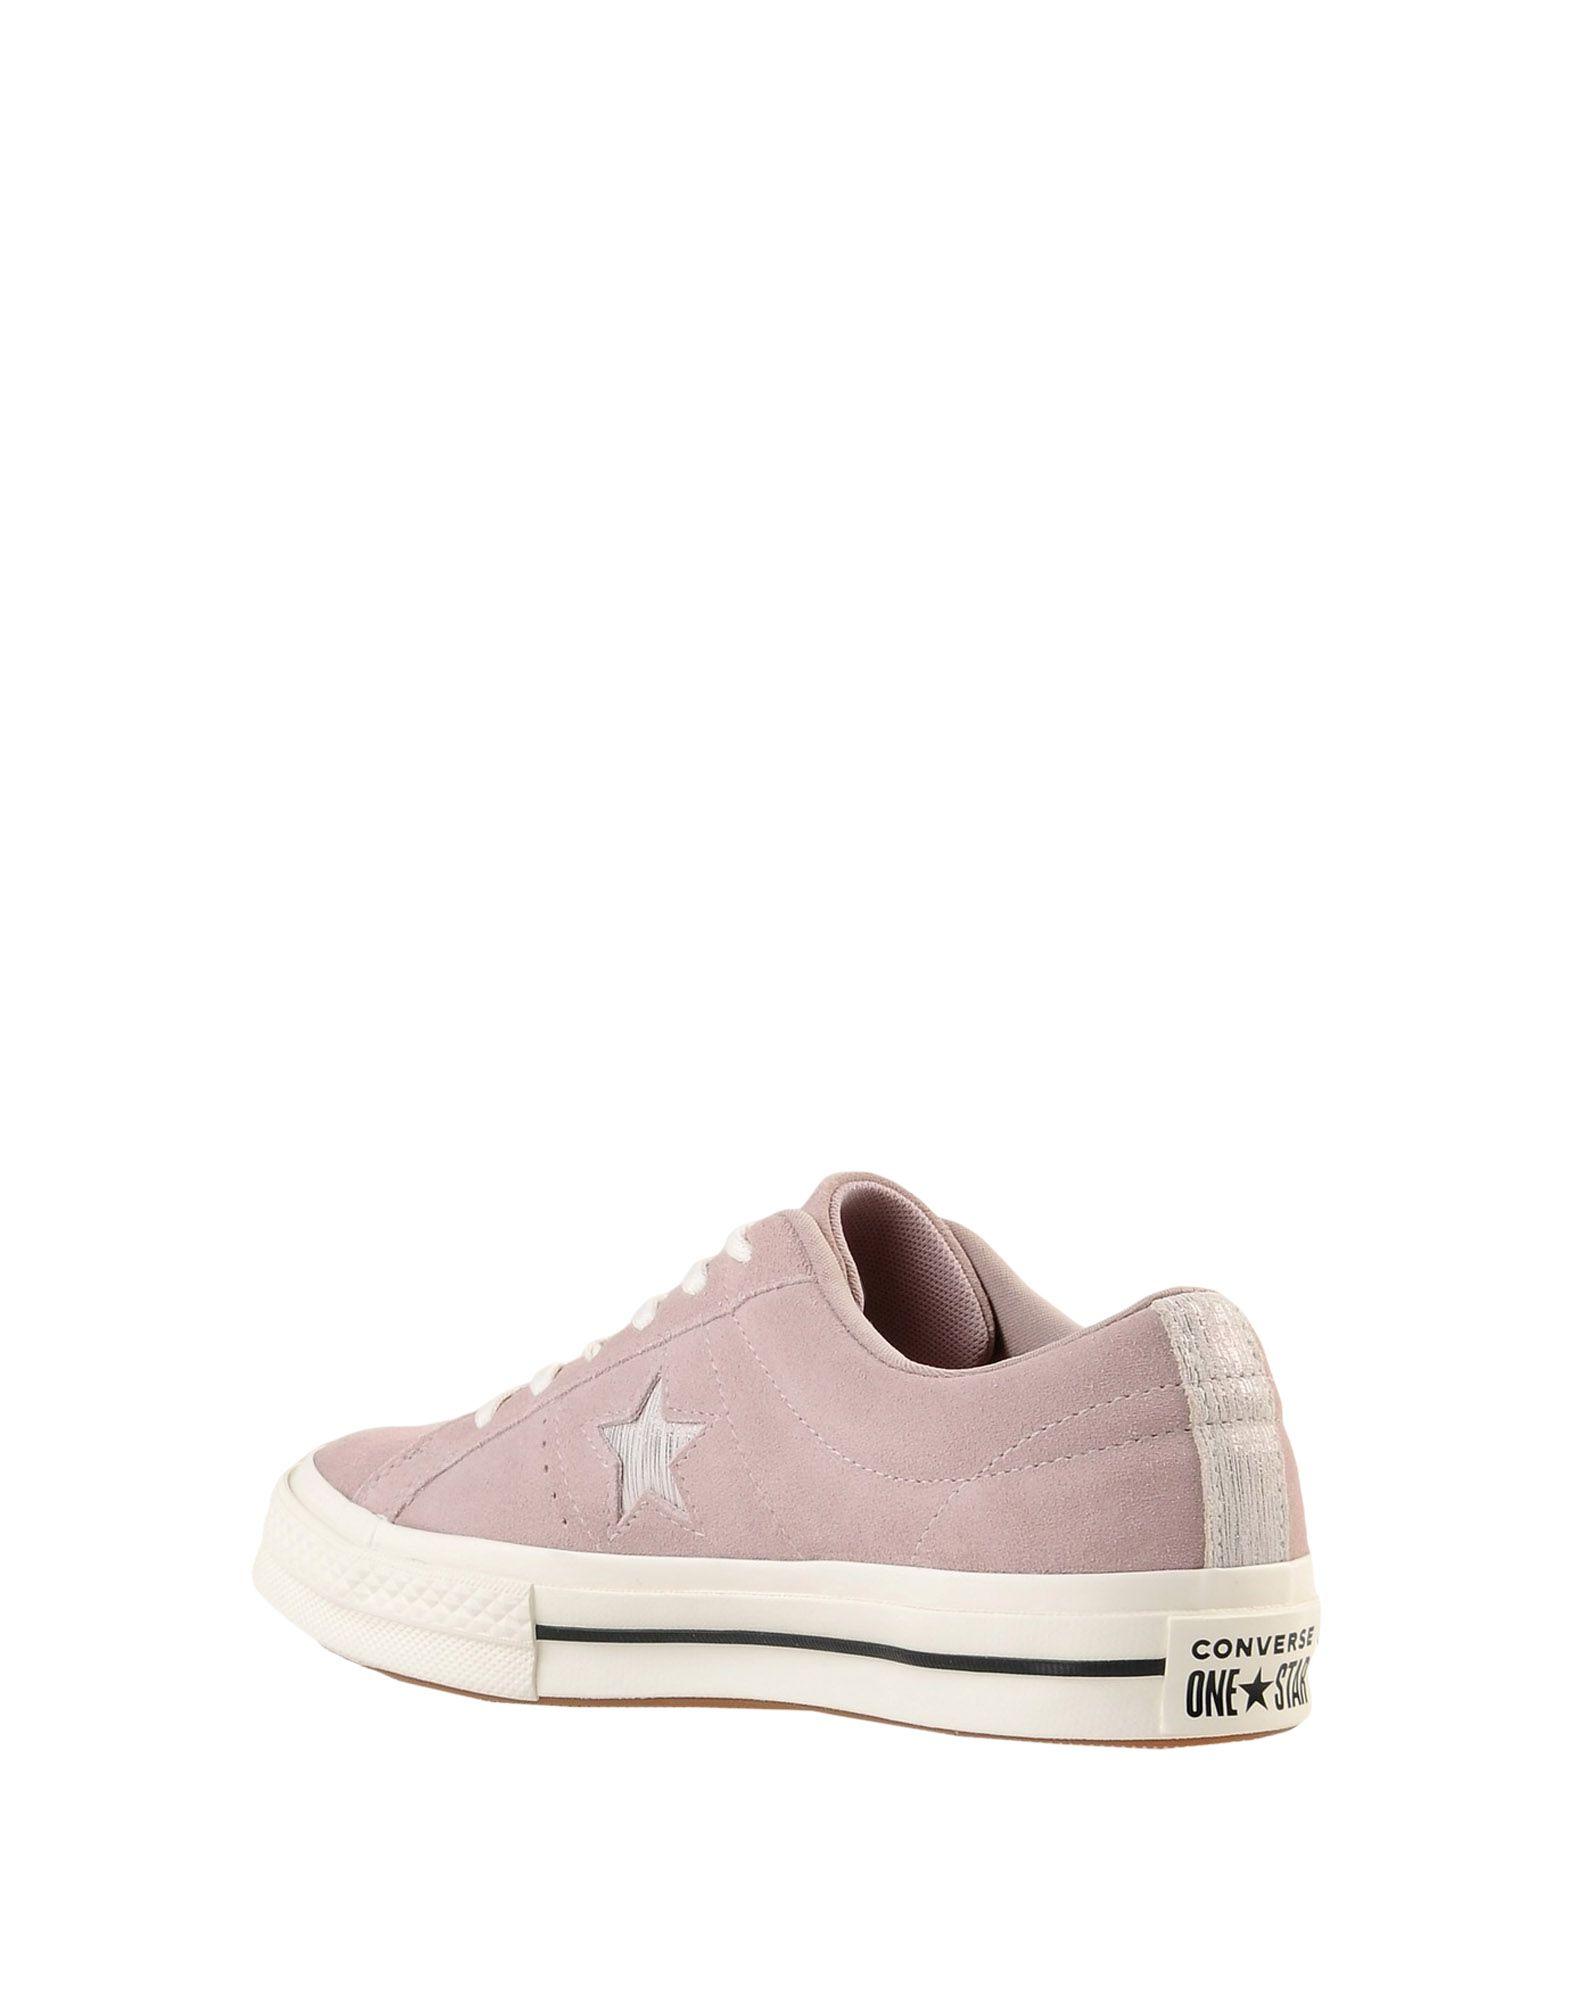 Converse One Star One Star Ox  Qualität 11551779UK Gute Qualität  beliebte Schuhe 1839fe